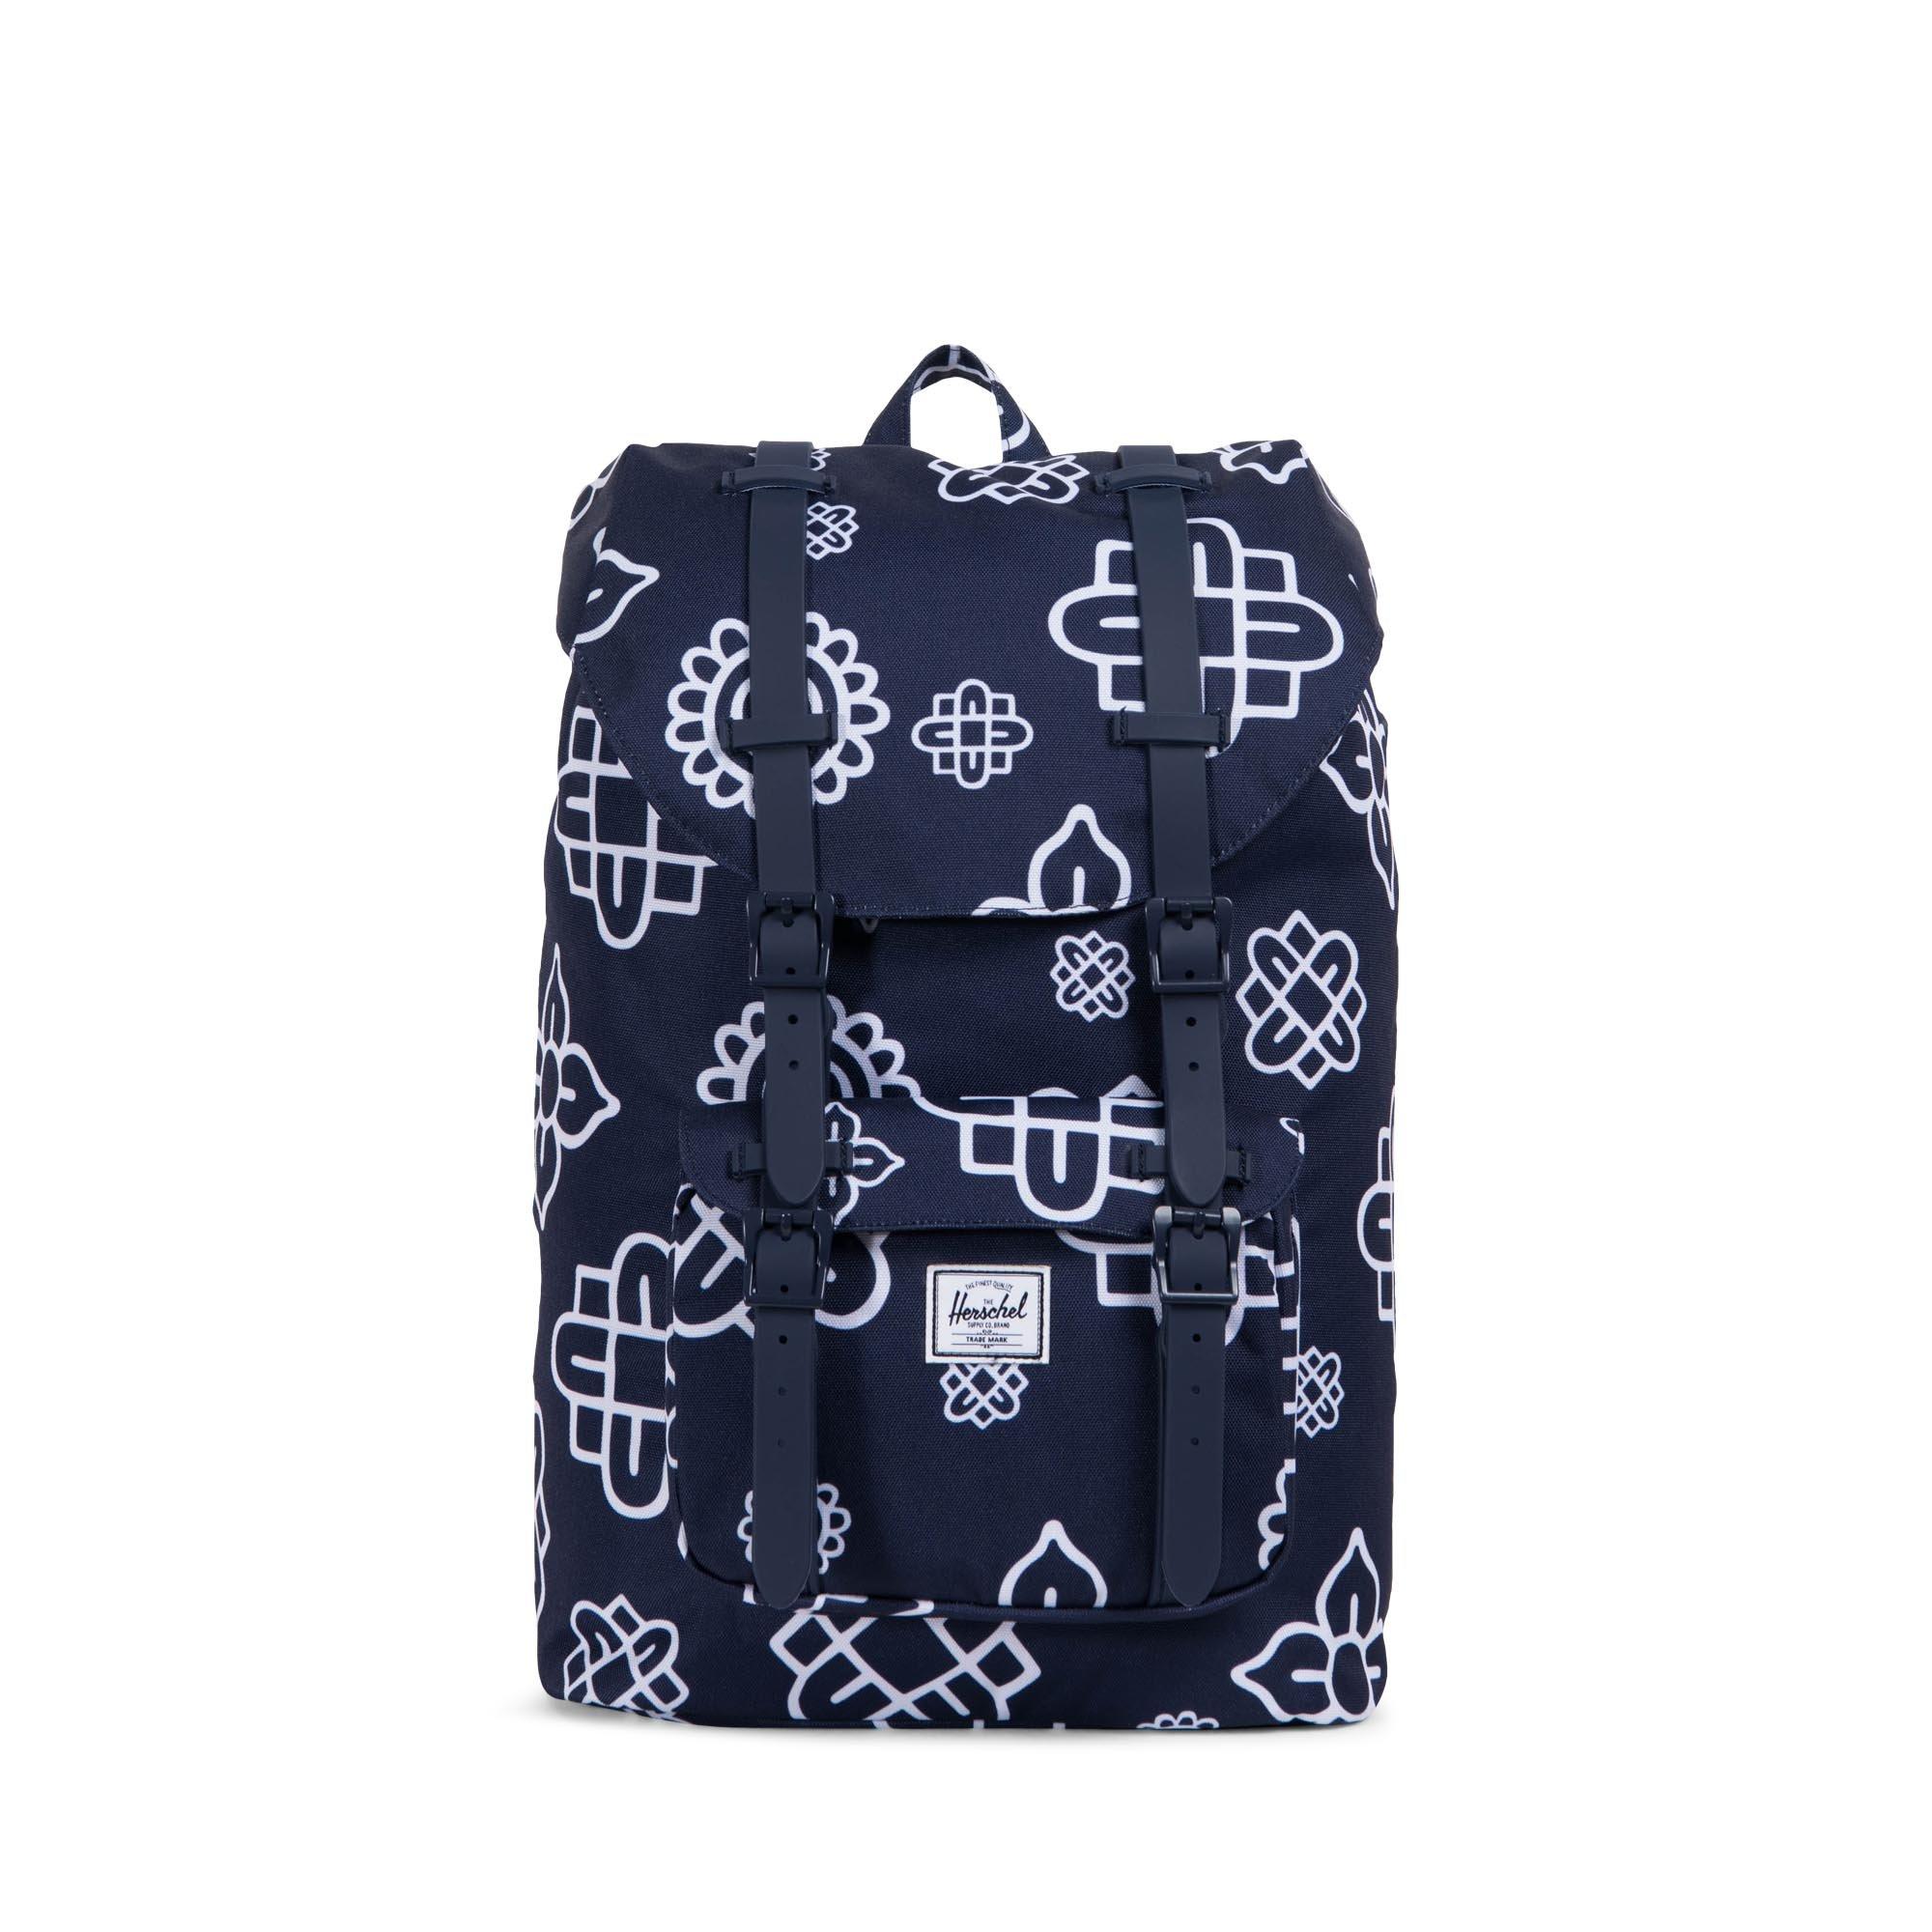 Herschel Supply Co. Little America Mid-Volume Backpack, Peacoat Paisley Print/Peacoat Rubber